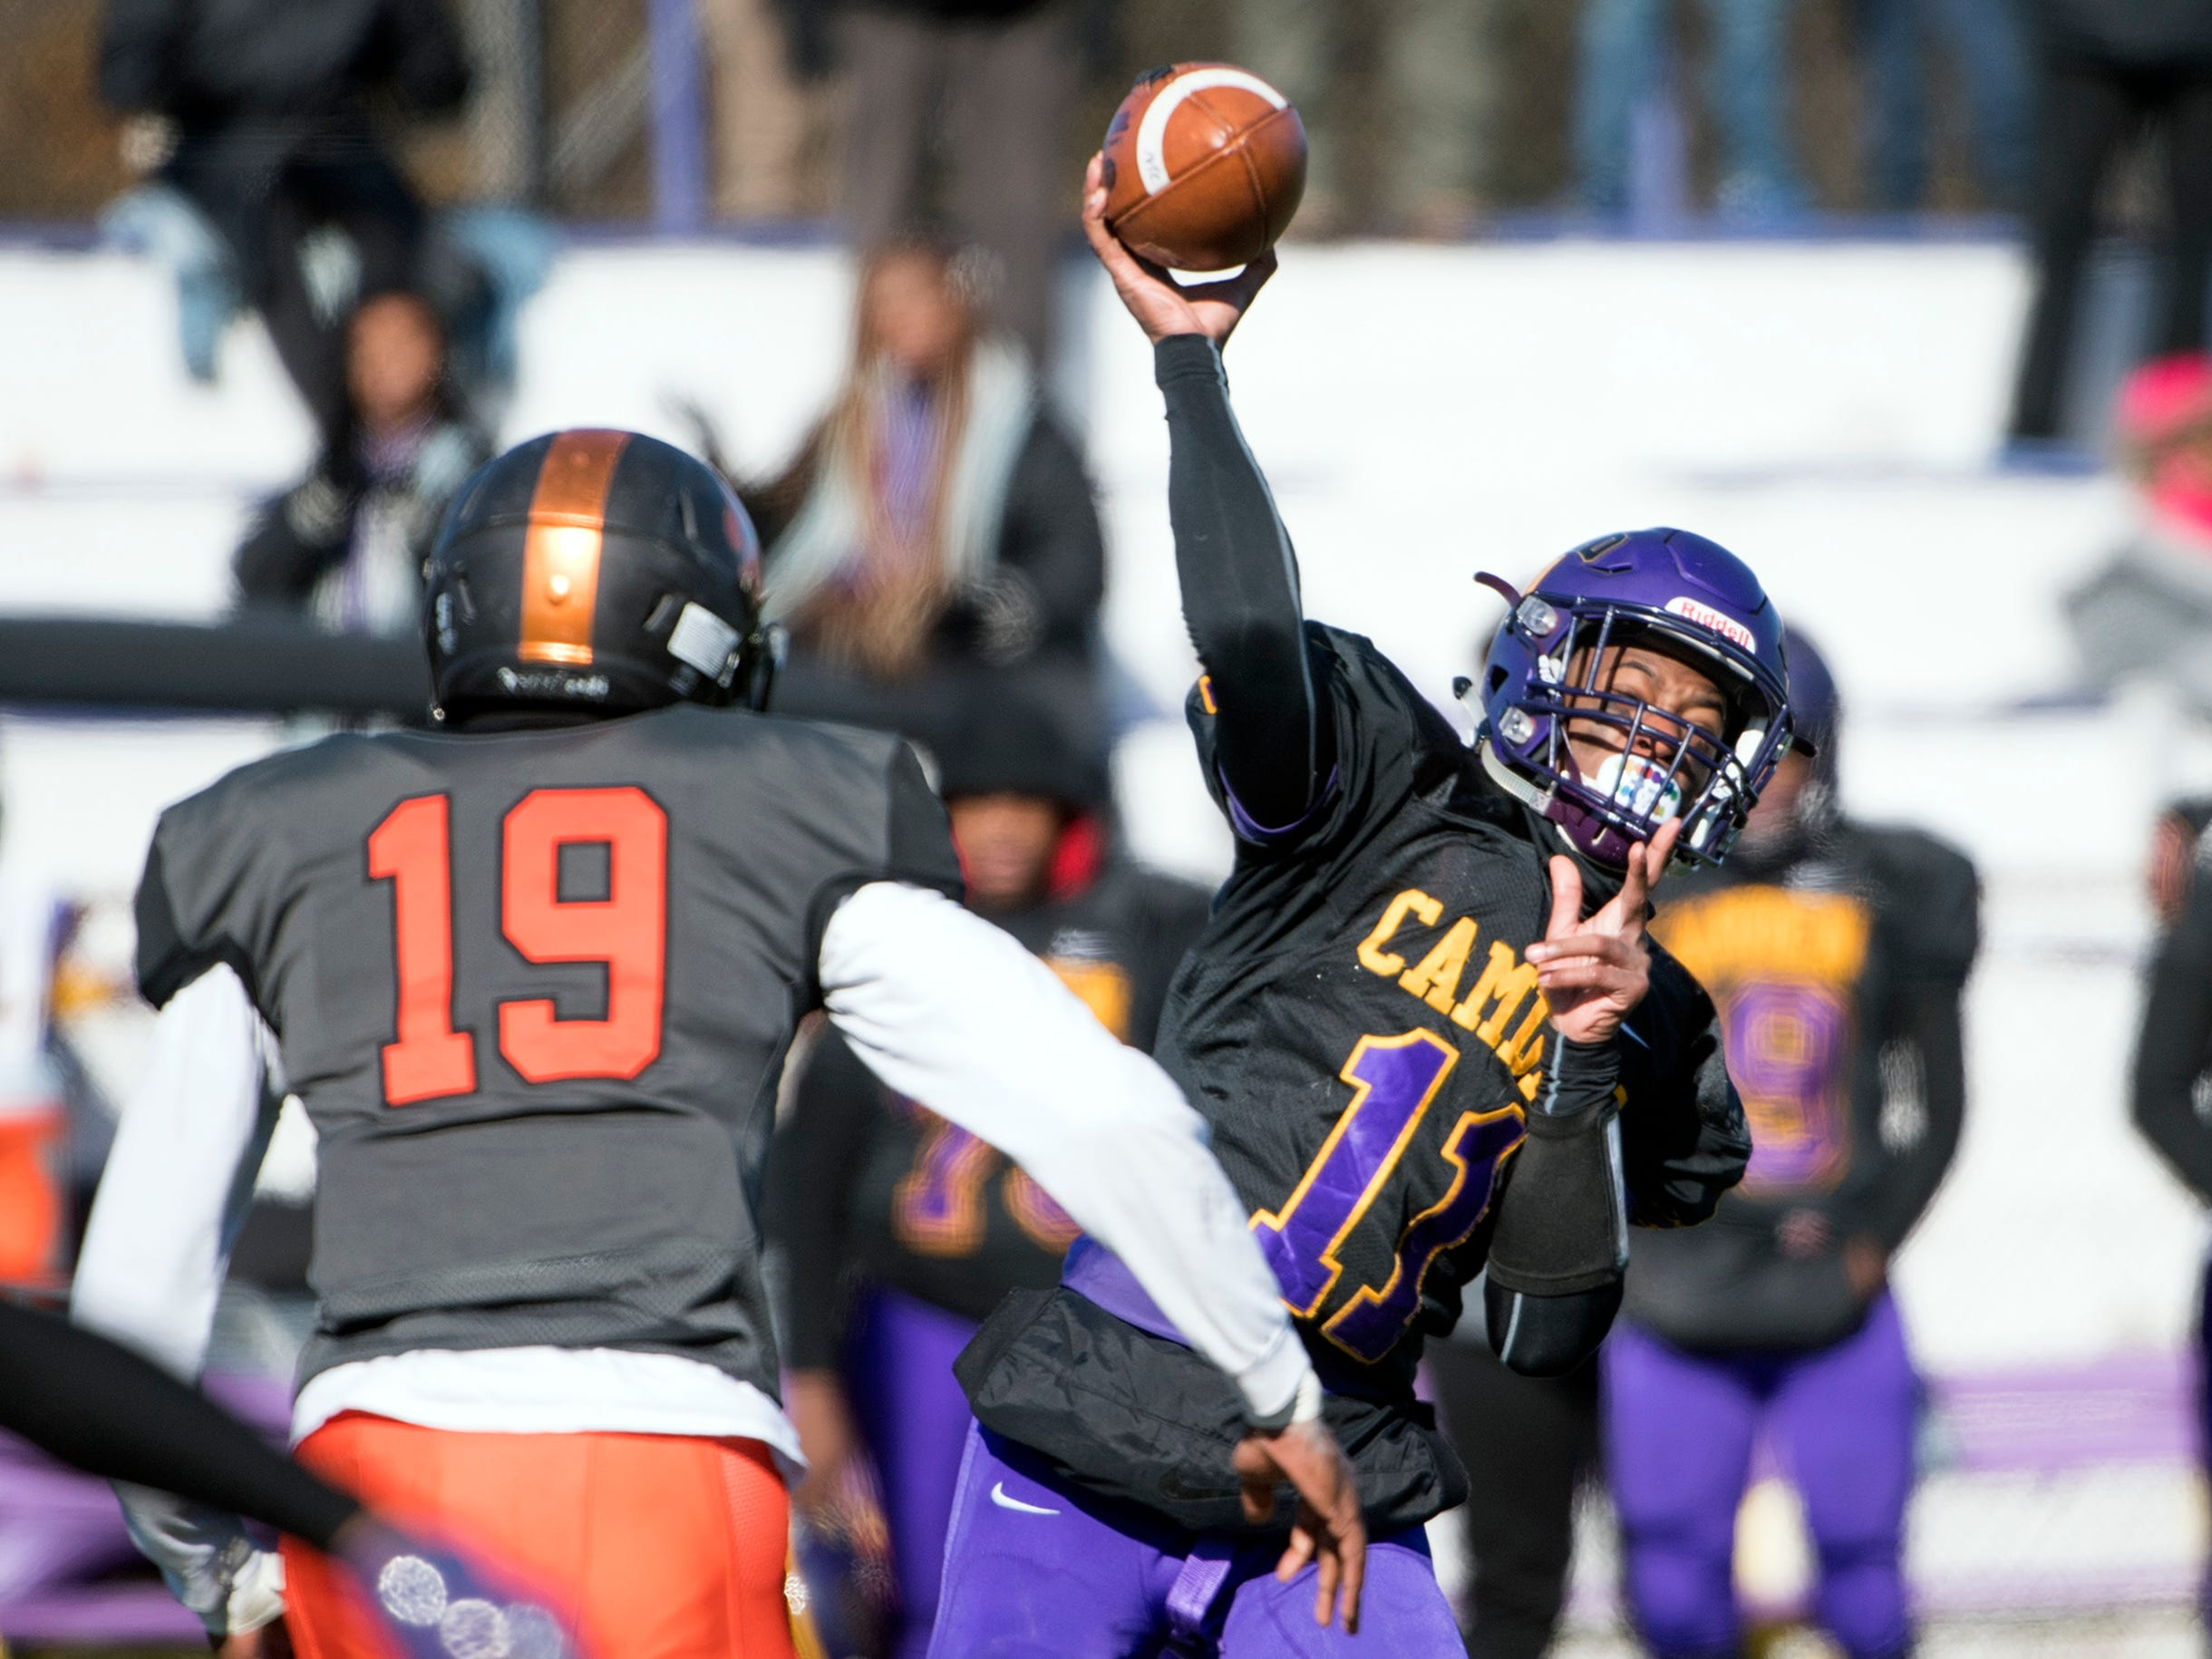 Camden's Monte Williams (11) passes the ball during an annual Camden-Woodrow Wilson Thanksgiving game Thursday, Nov. 22, 2018 in Camden, N.J. Camden won 39-28.